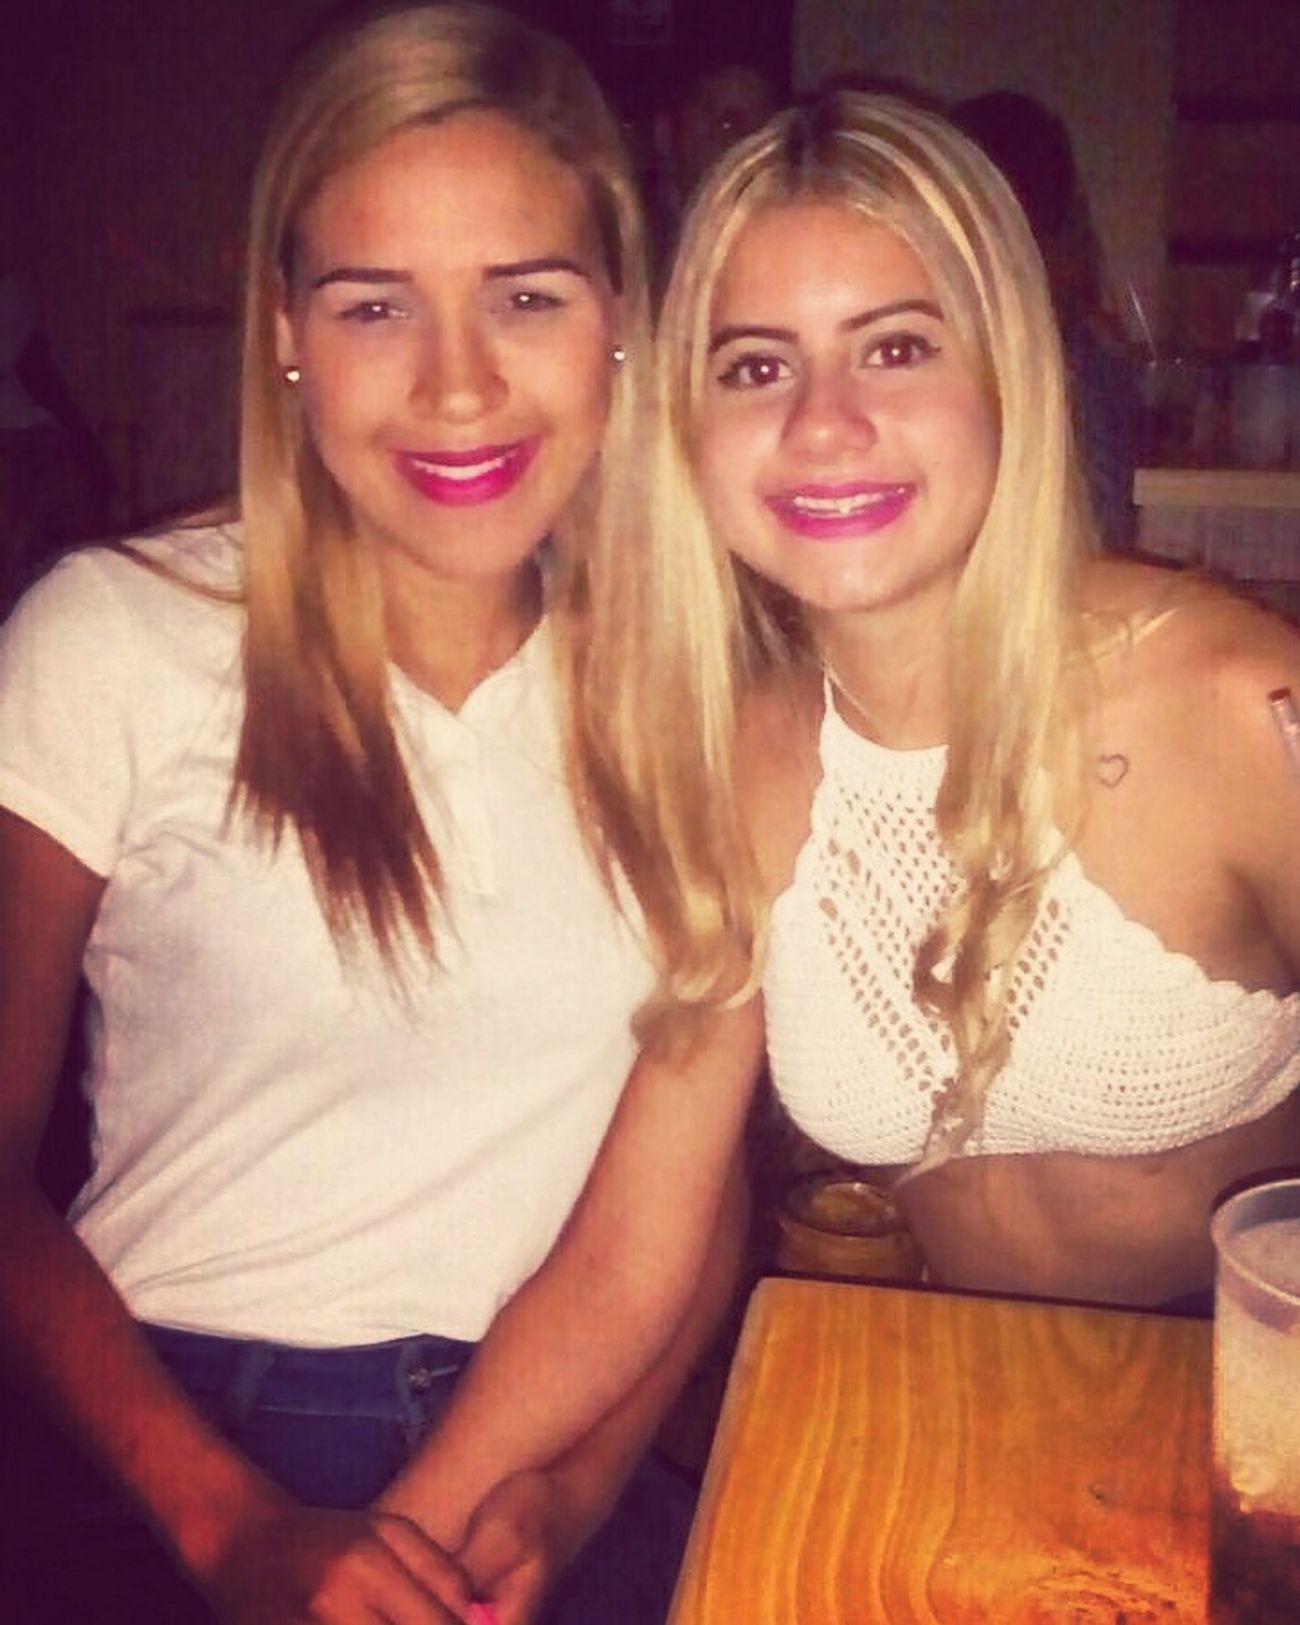 Blonde Girl Blonde ♡ Party Bahamas Cousins ❤